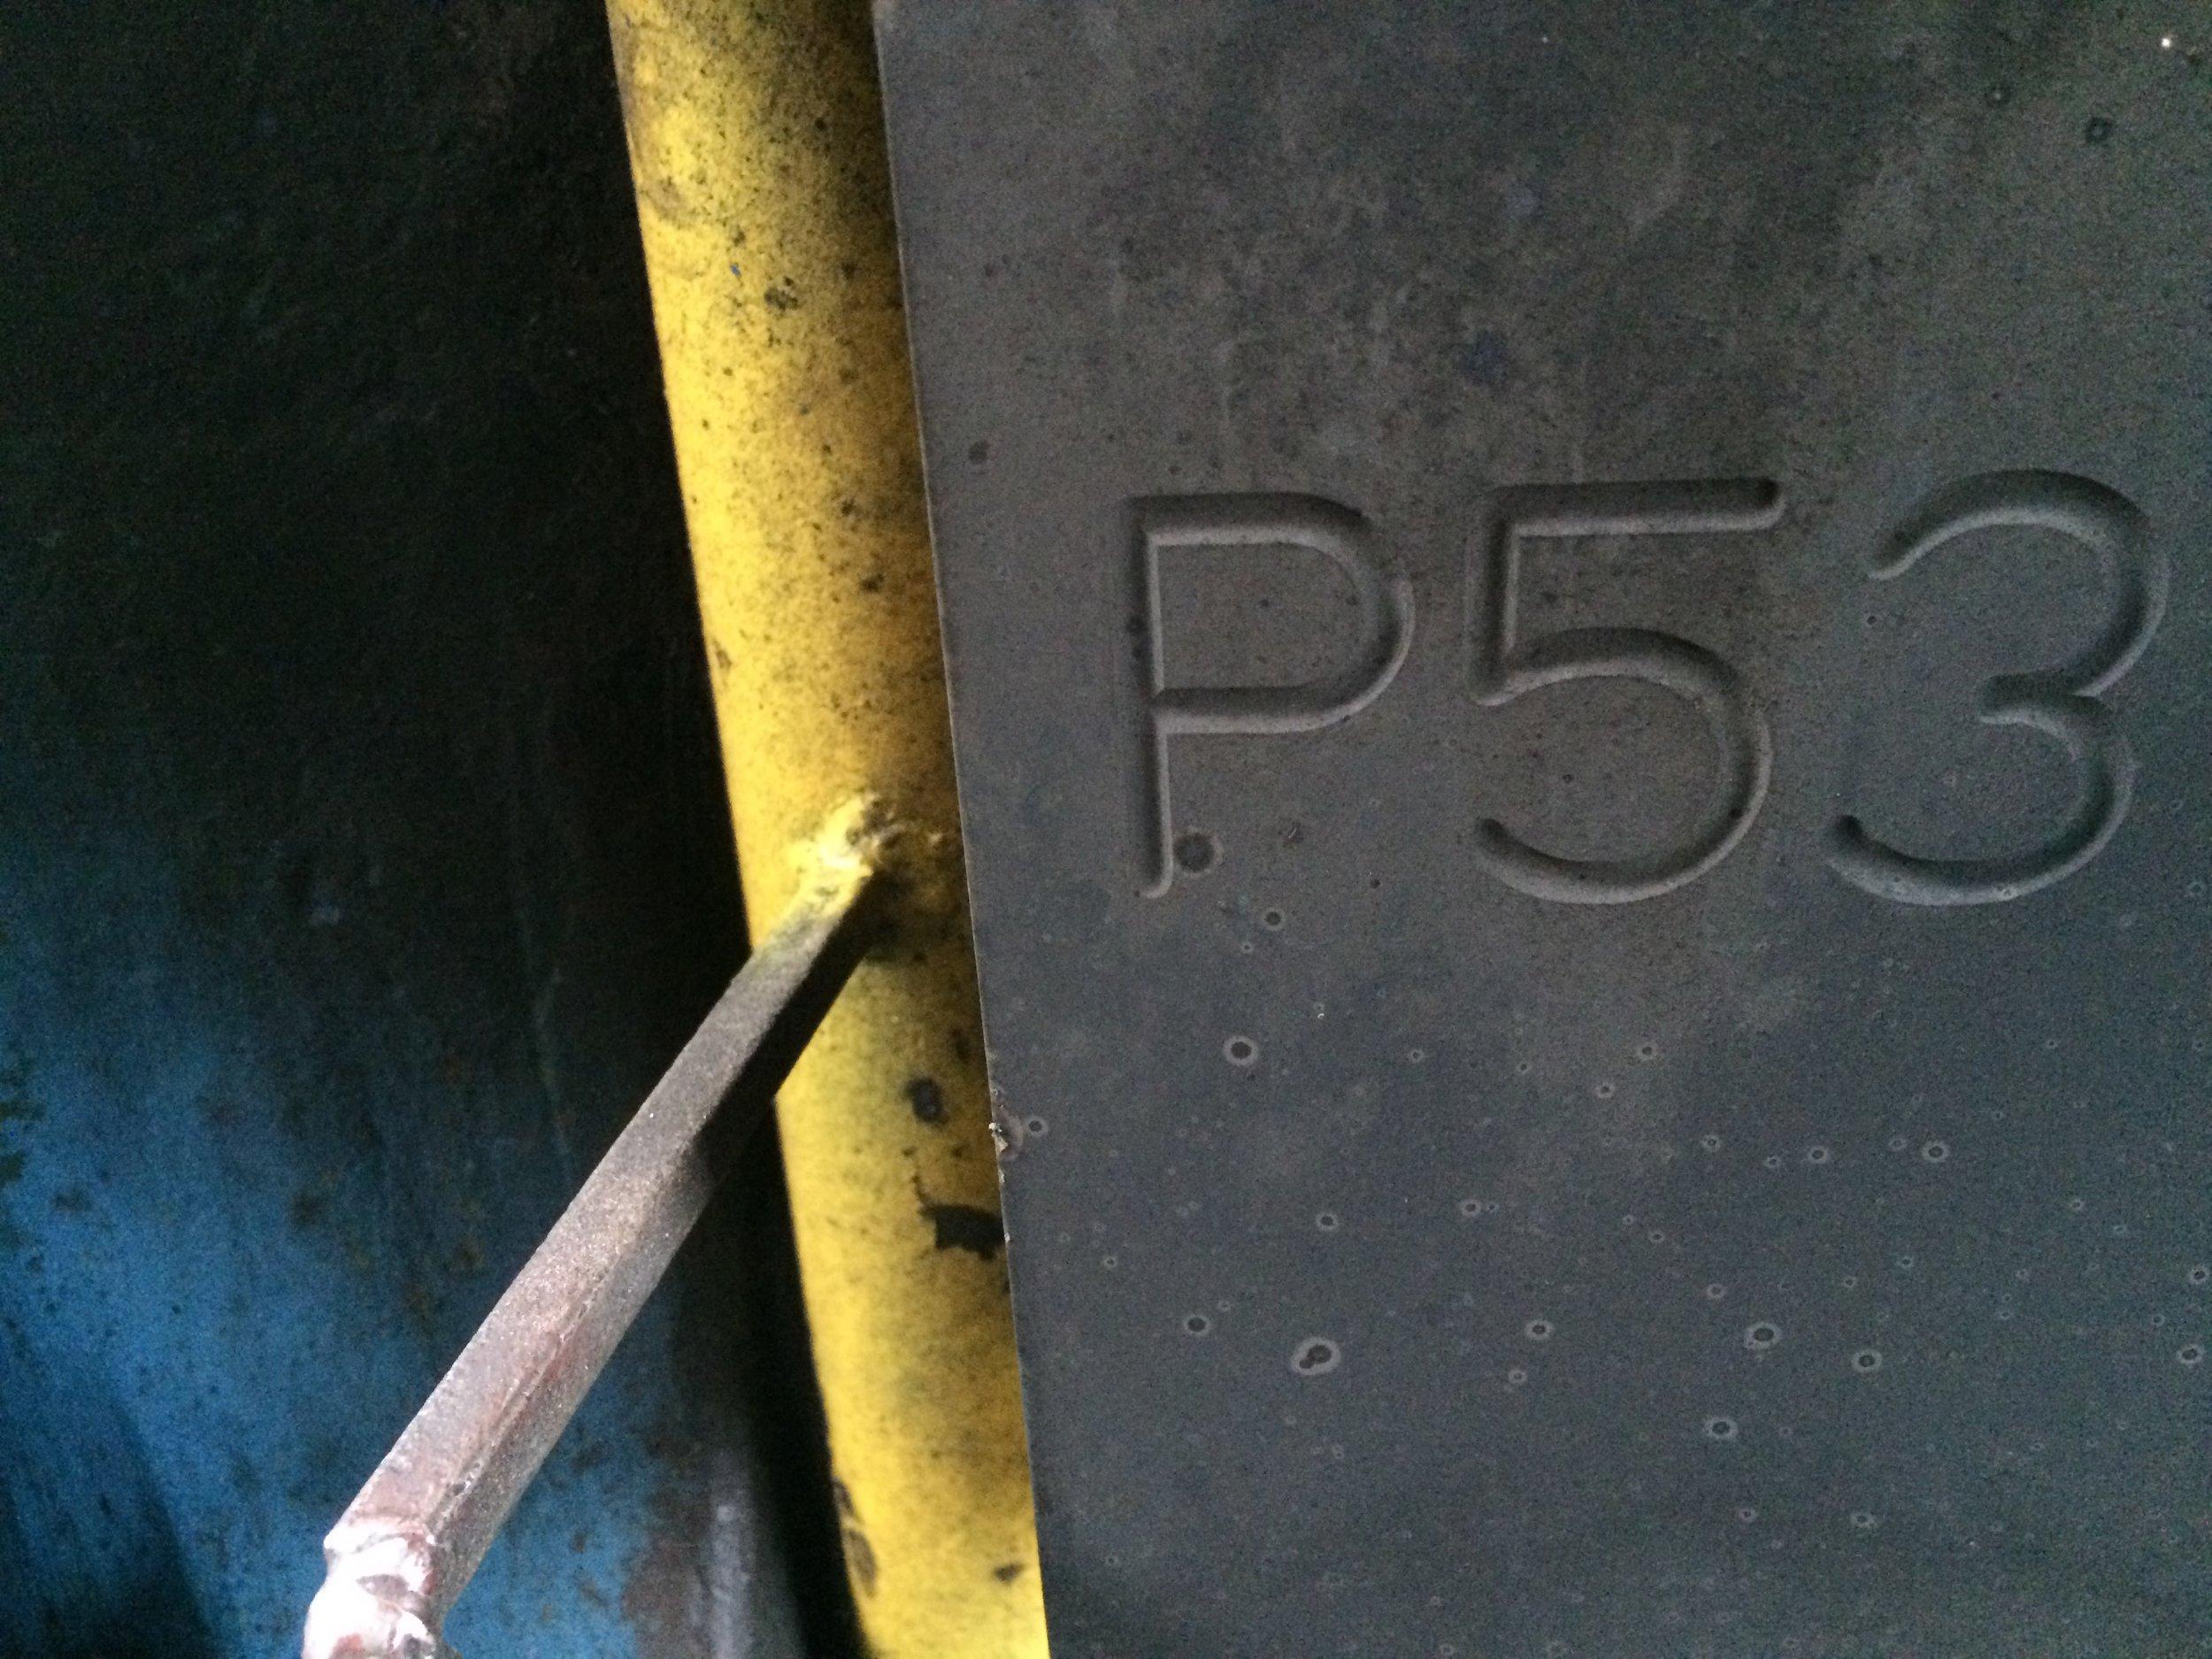 P53 Authentic American Irons Image 9.JPG